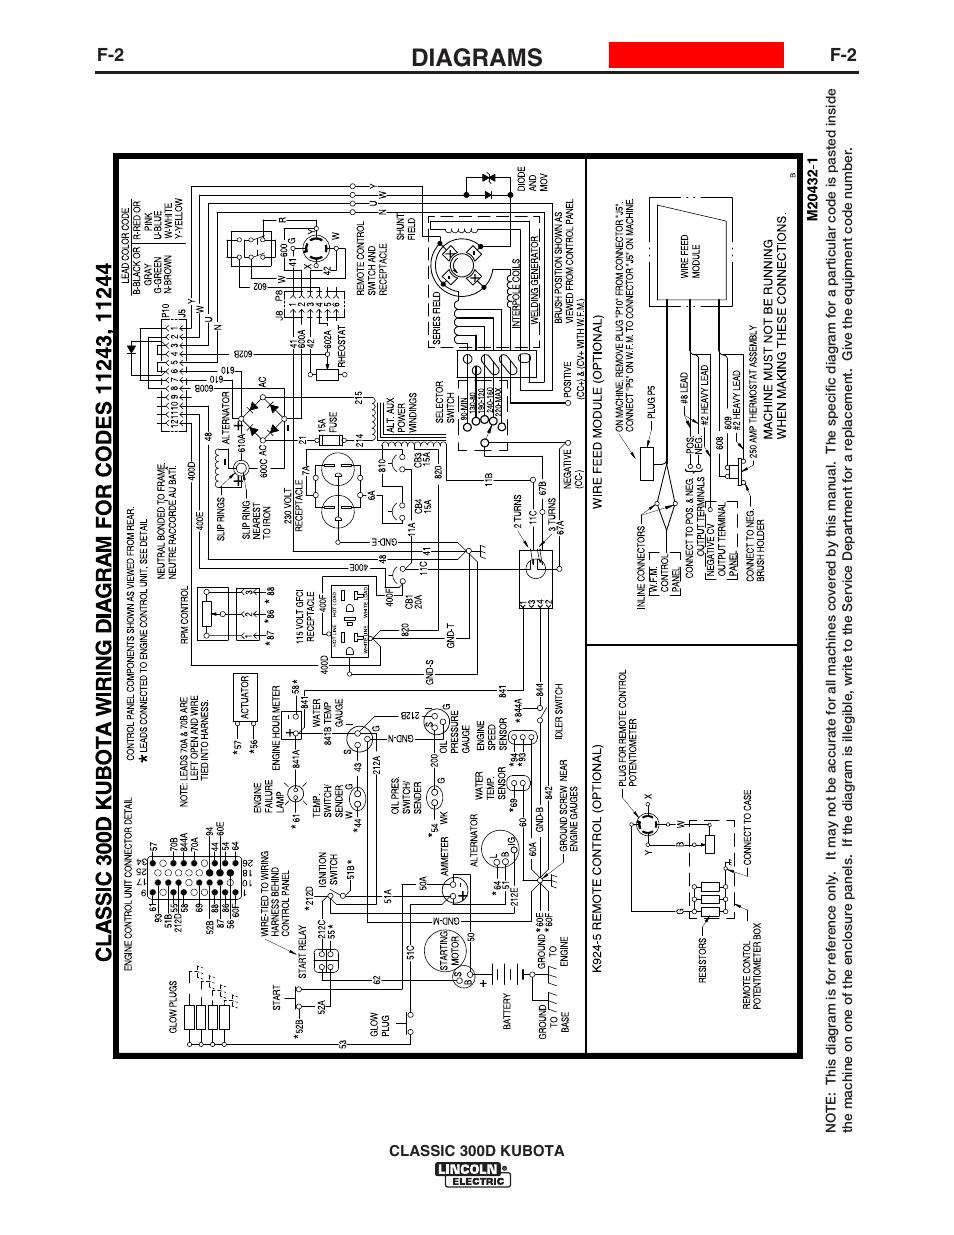 Diagram Of Lincoln 300d Reinvent Your Wiring Diagrams Electric Classic Kubota Im843 C User Manual Rh Manualsdir Com